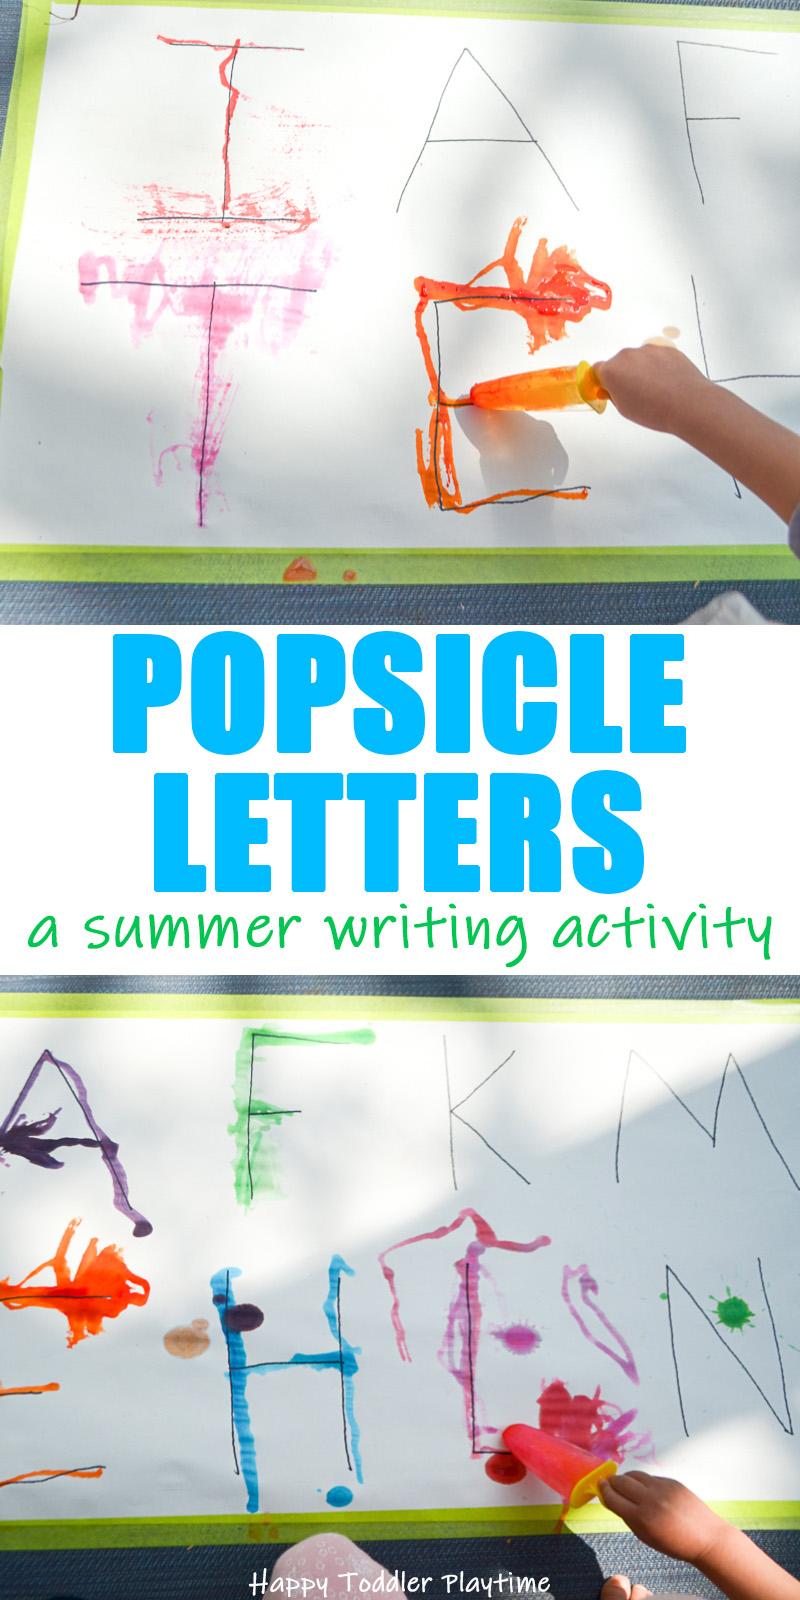 Popsicle letters preschooler activity